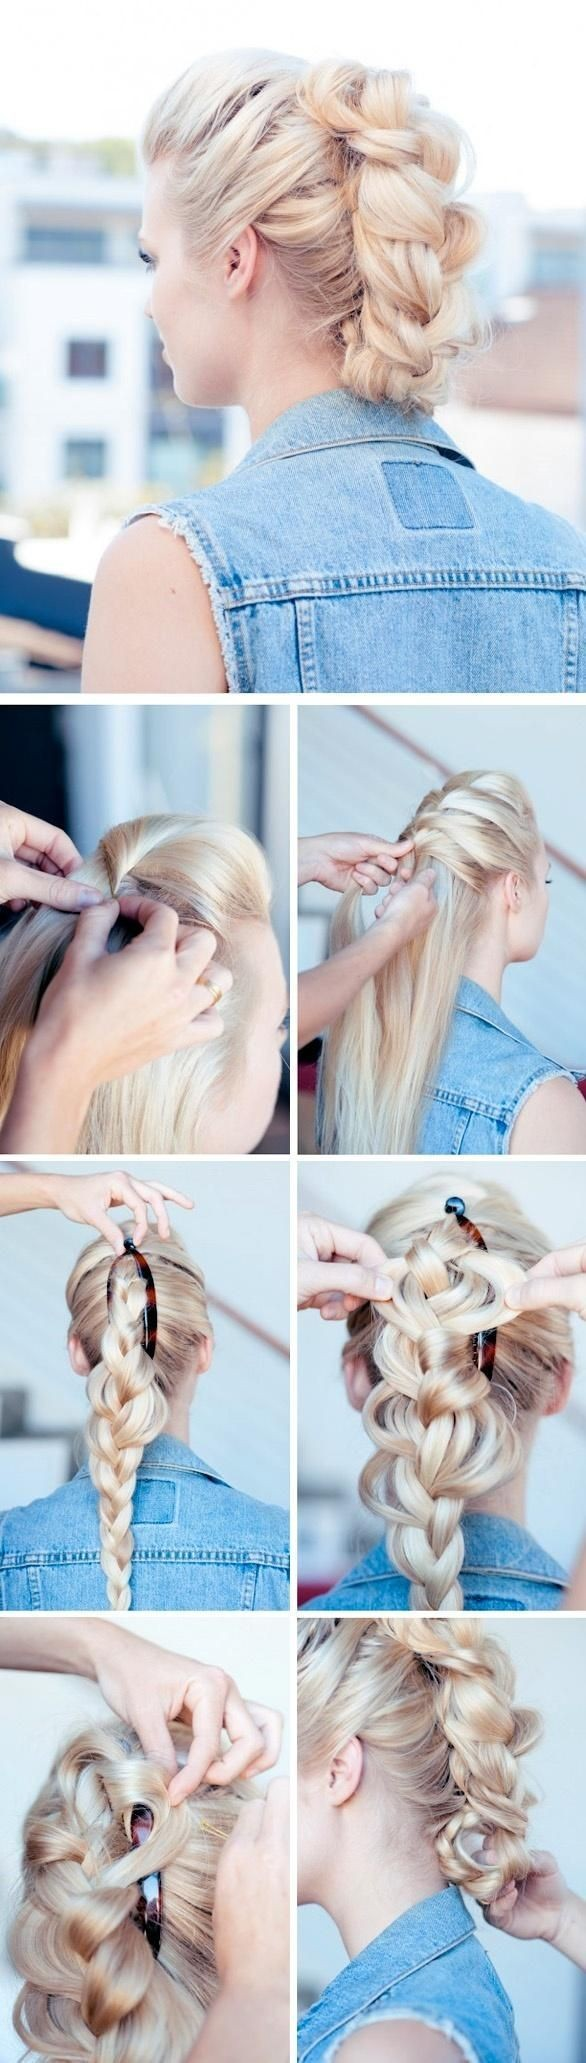 Braided-Updo-Hair-Styles-Tutorial-Faux-Hawk-Updos